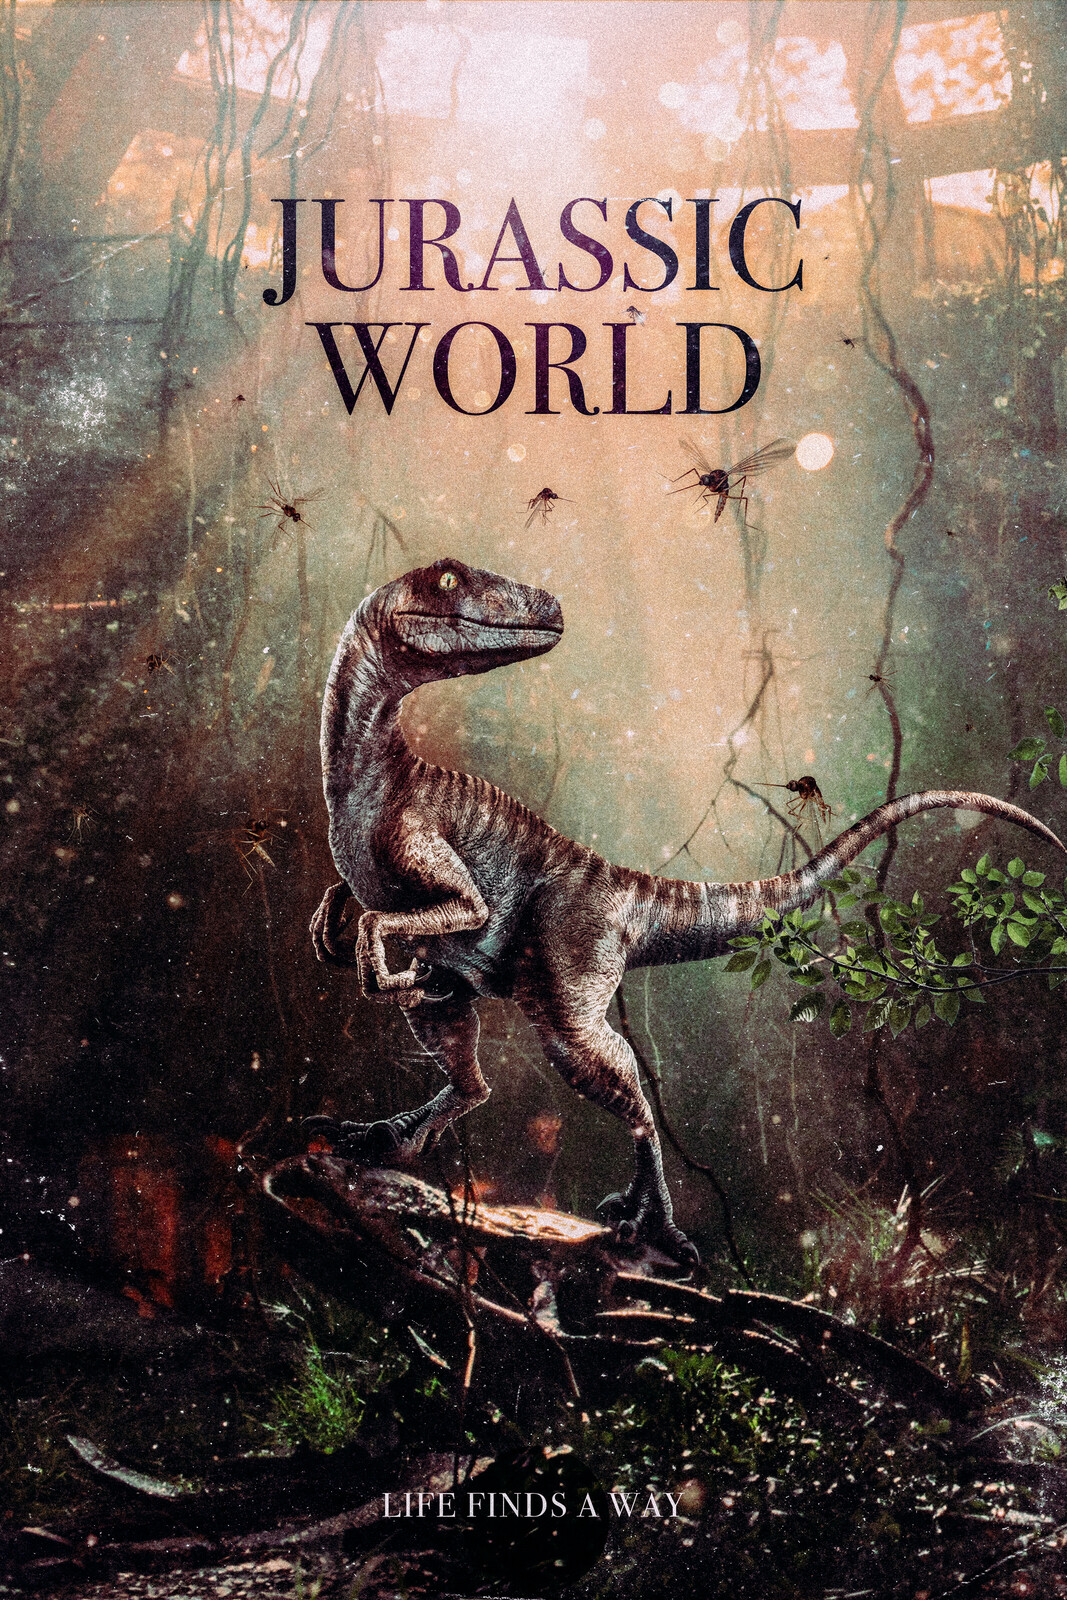 Jurassic World Alternate Velociraptor Movie Poster